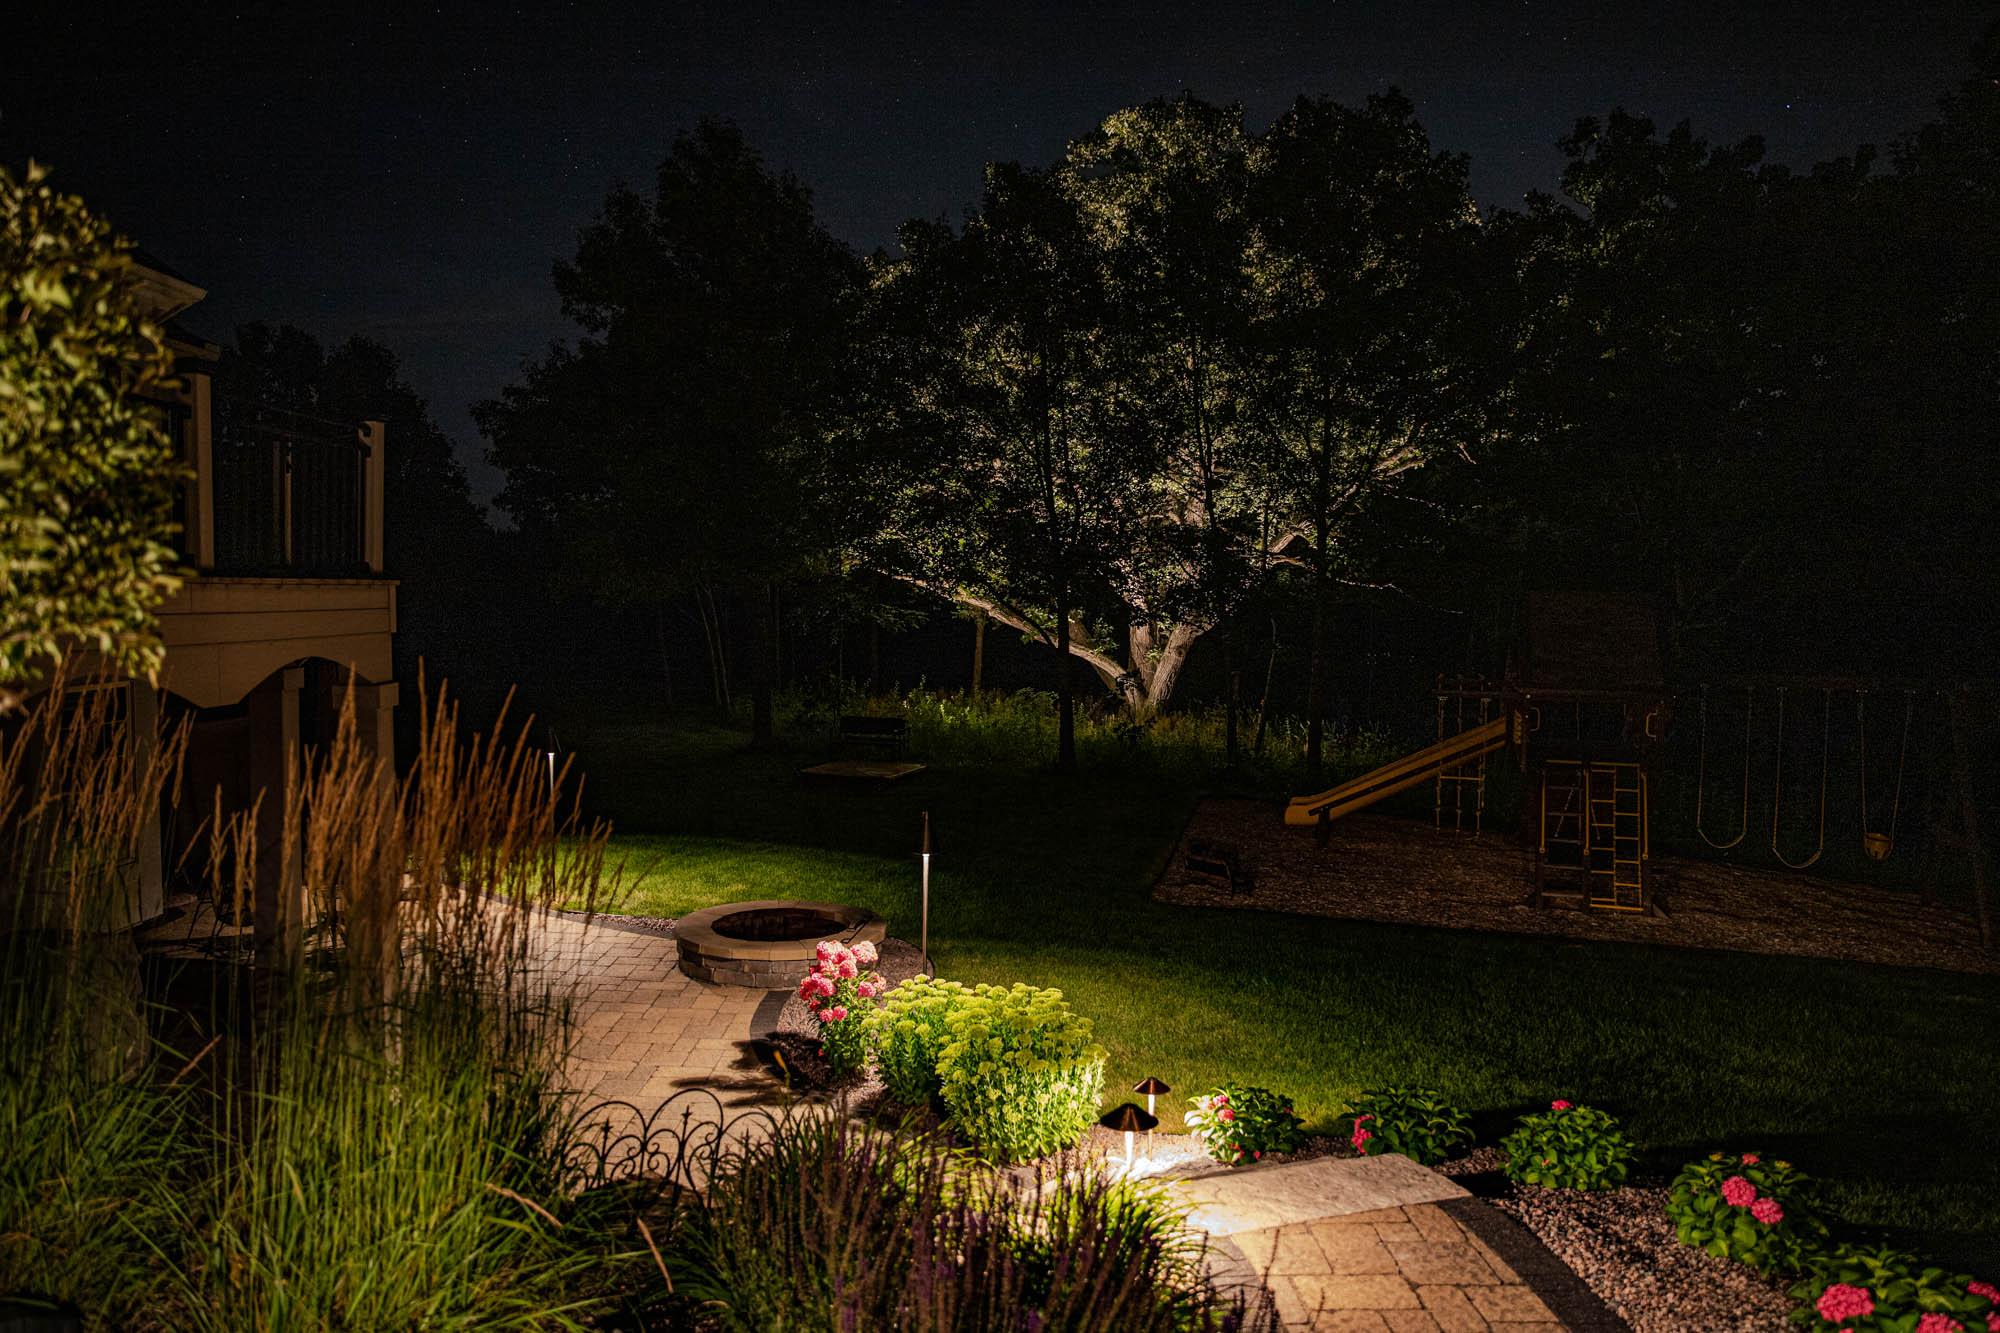 mukwonago landscape outdoor lighting night owl mature tree playground walkway steps path lights landscape plants